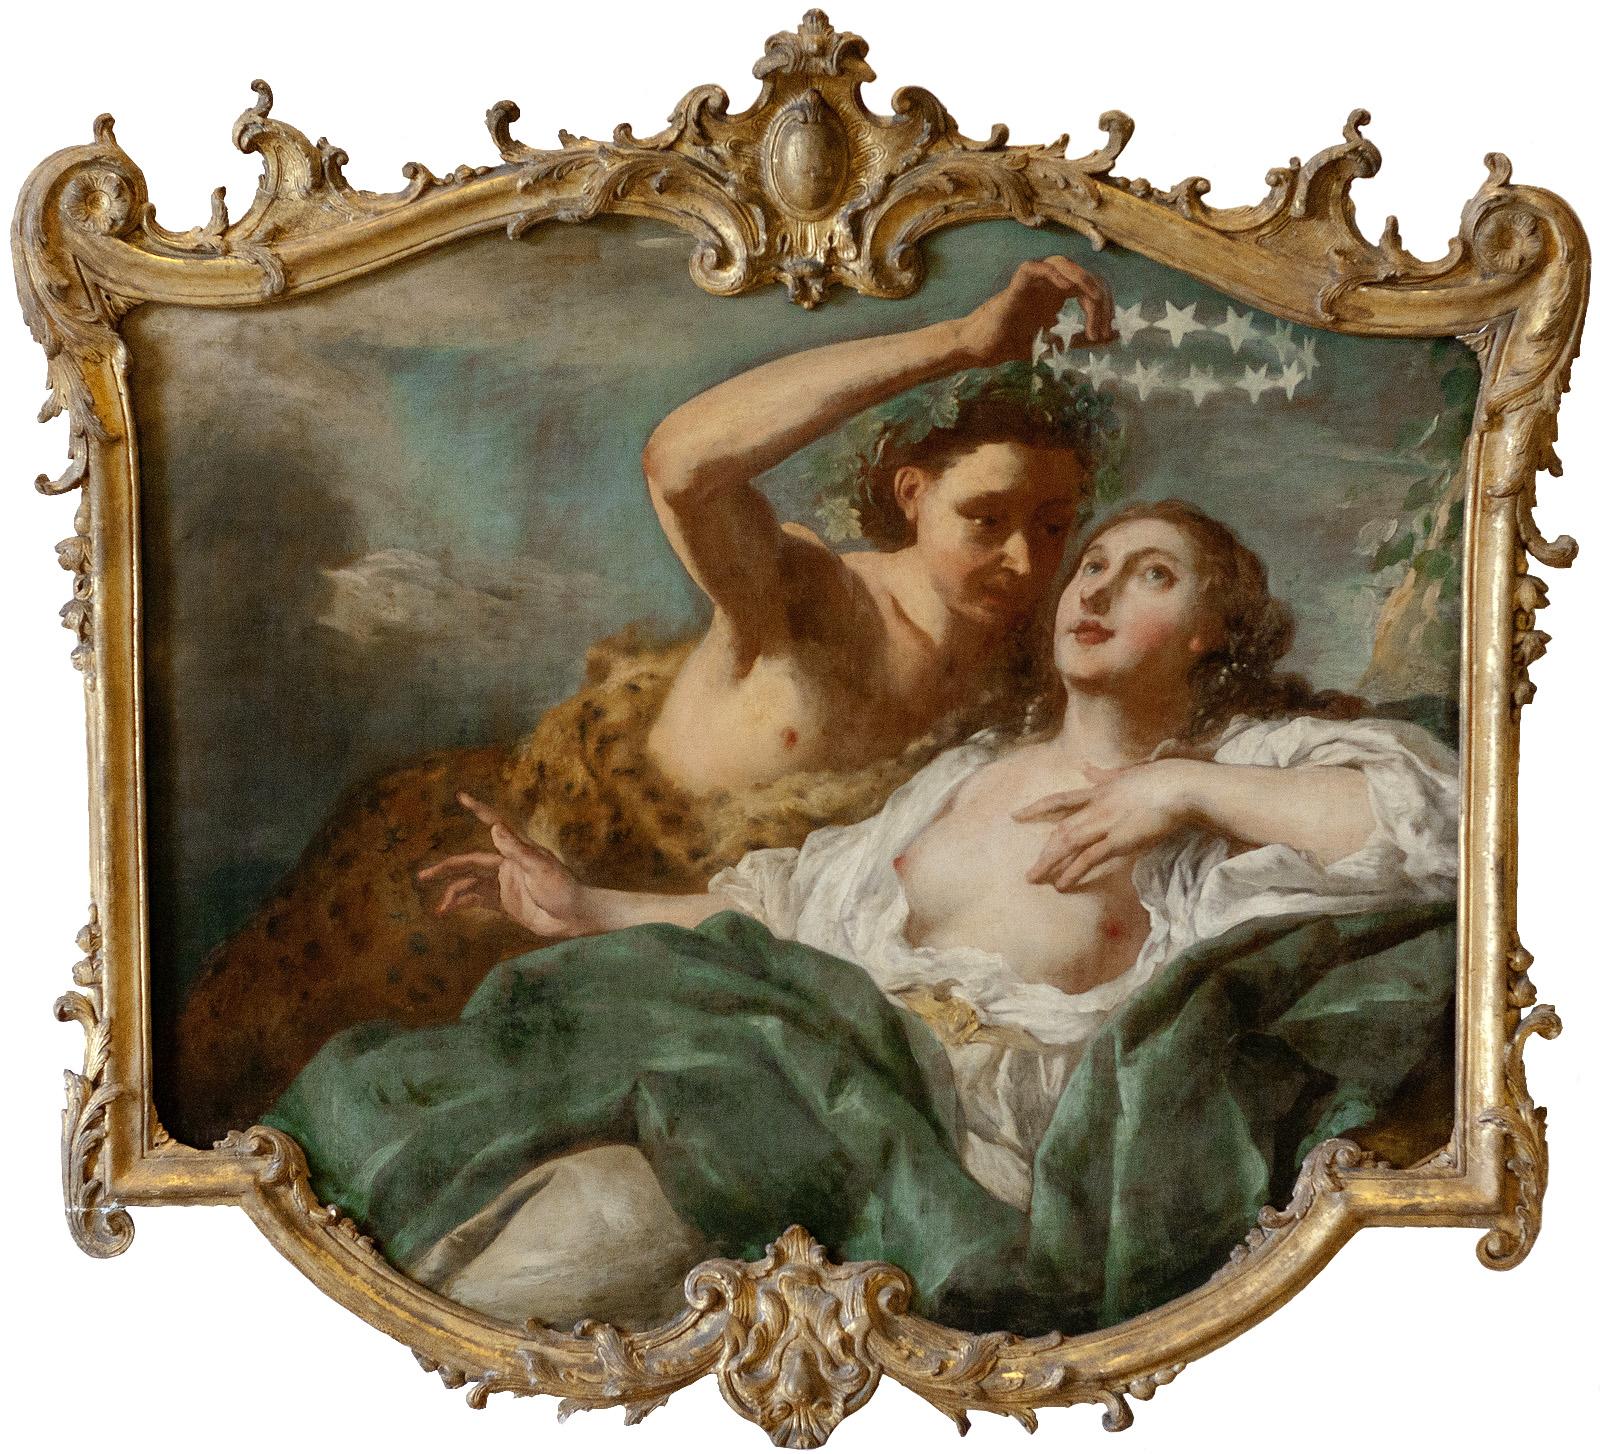 Ariane art museum date Philadelphia Art